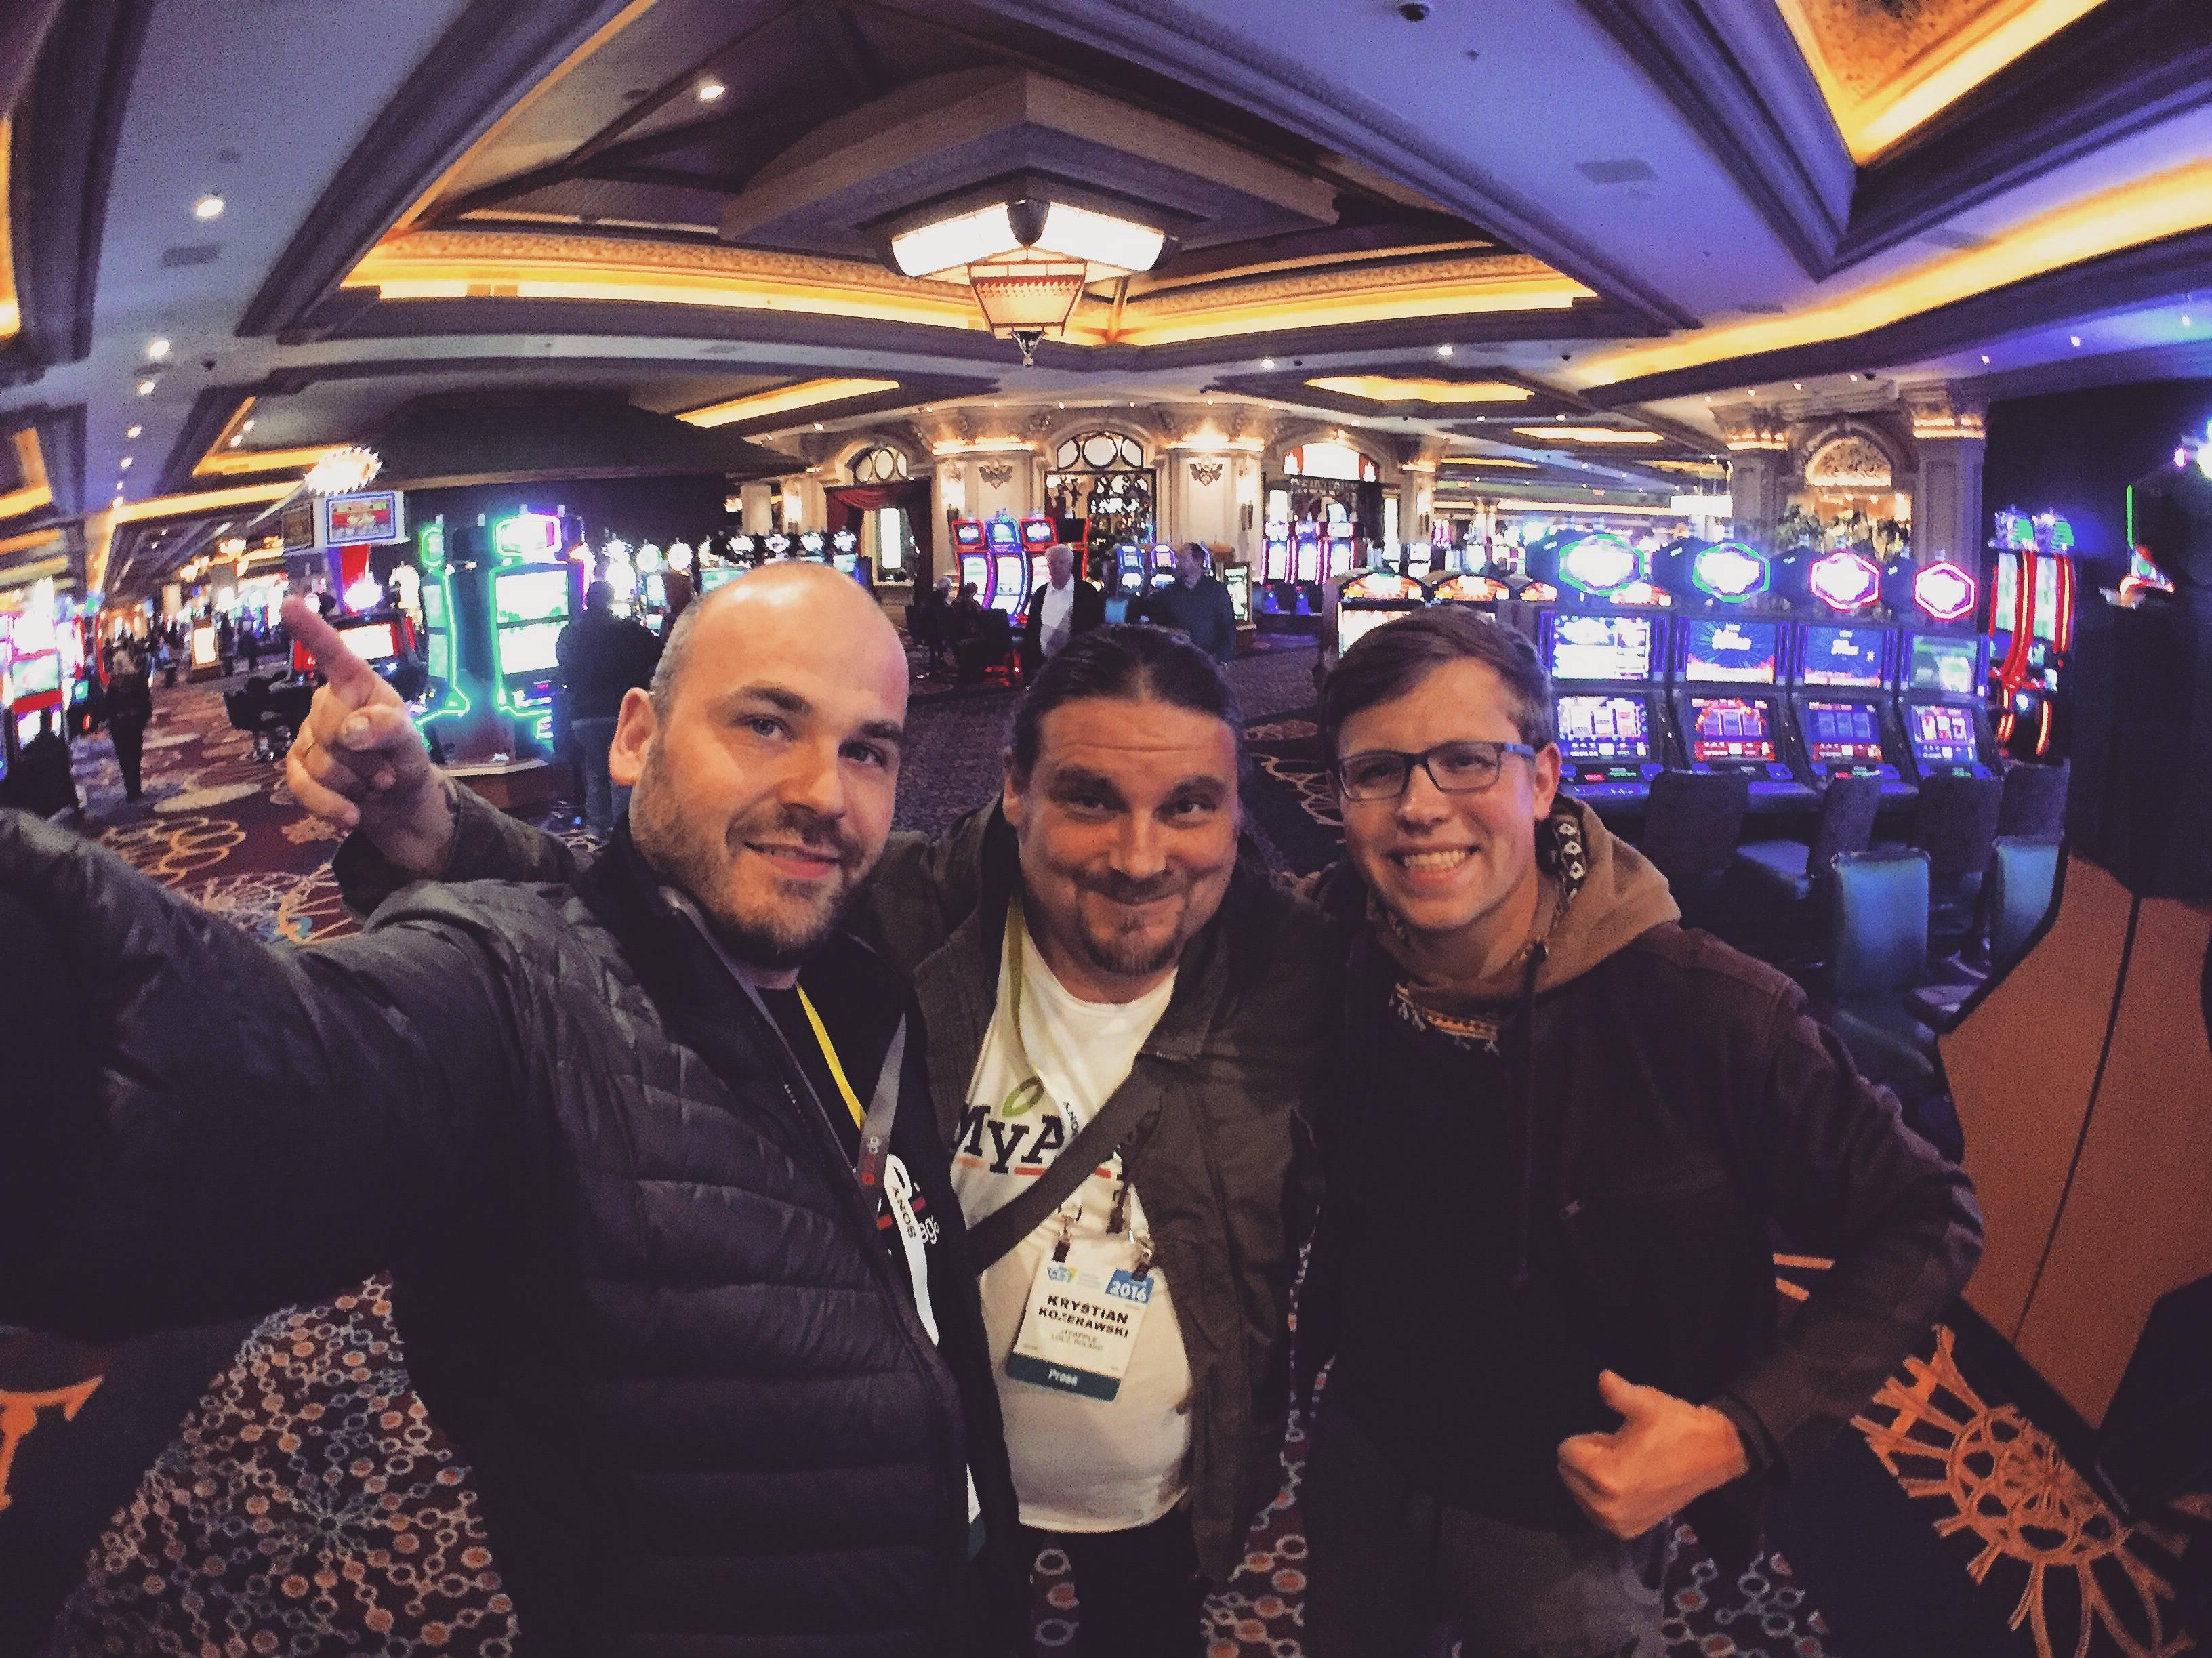 Targi CES 2016 w Las Vegas , z Tomkiem i Krystianem